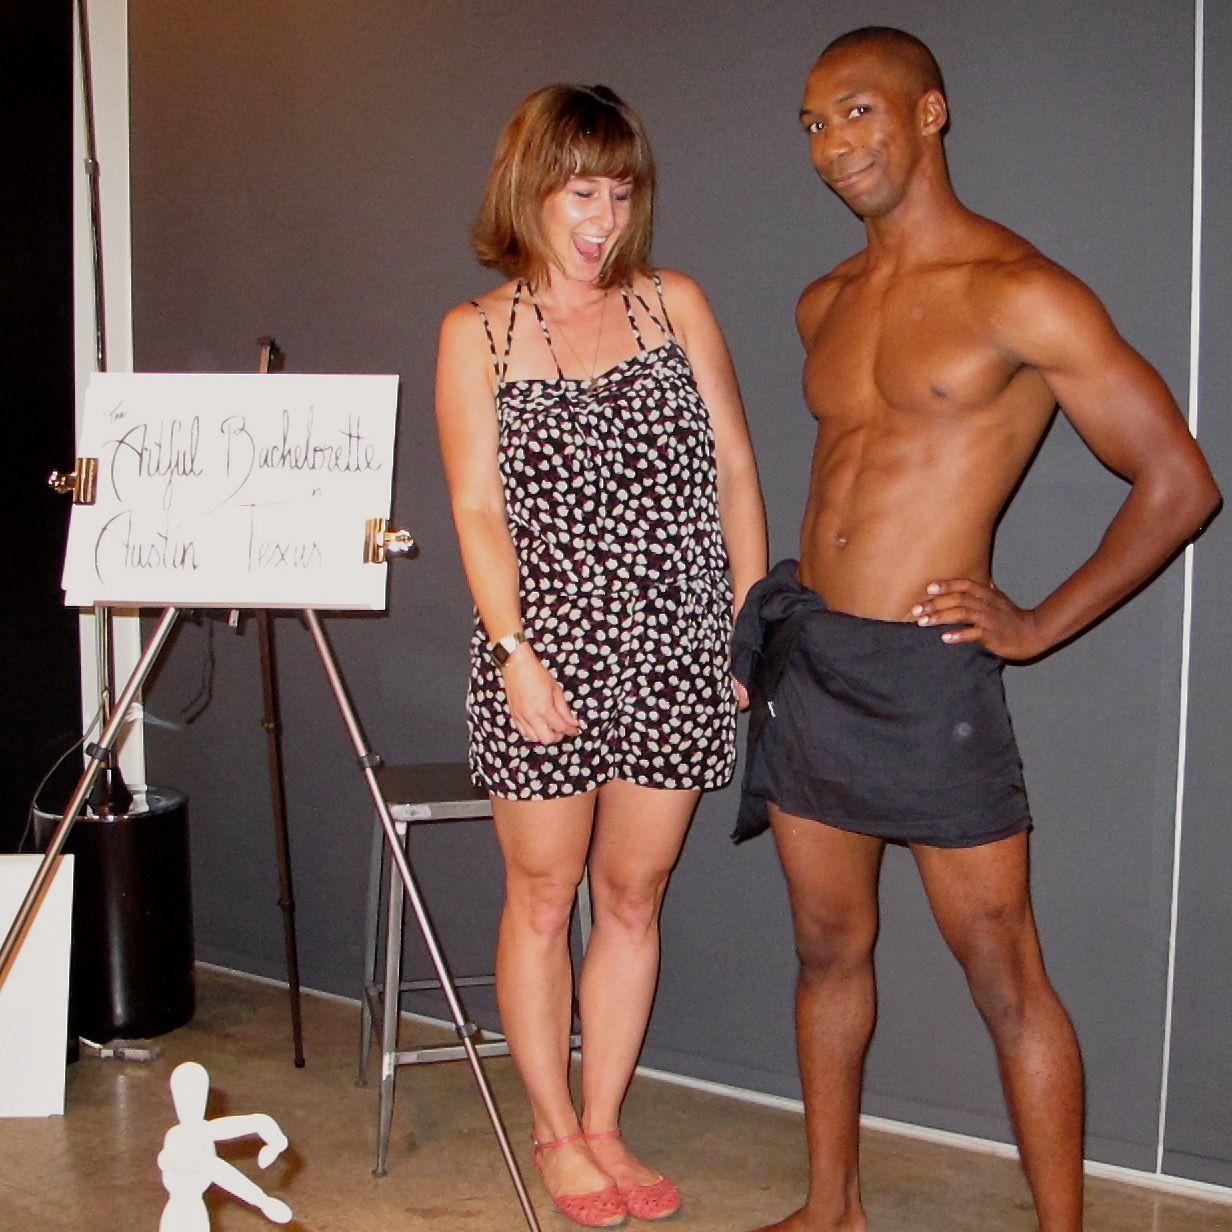 Plump women sex naked